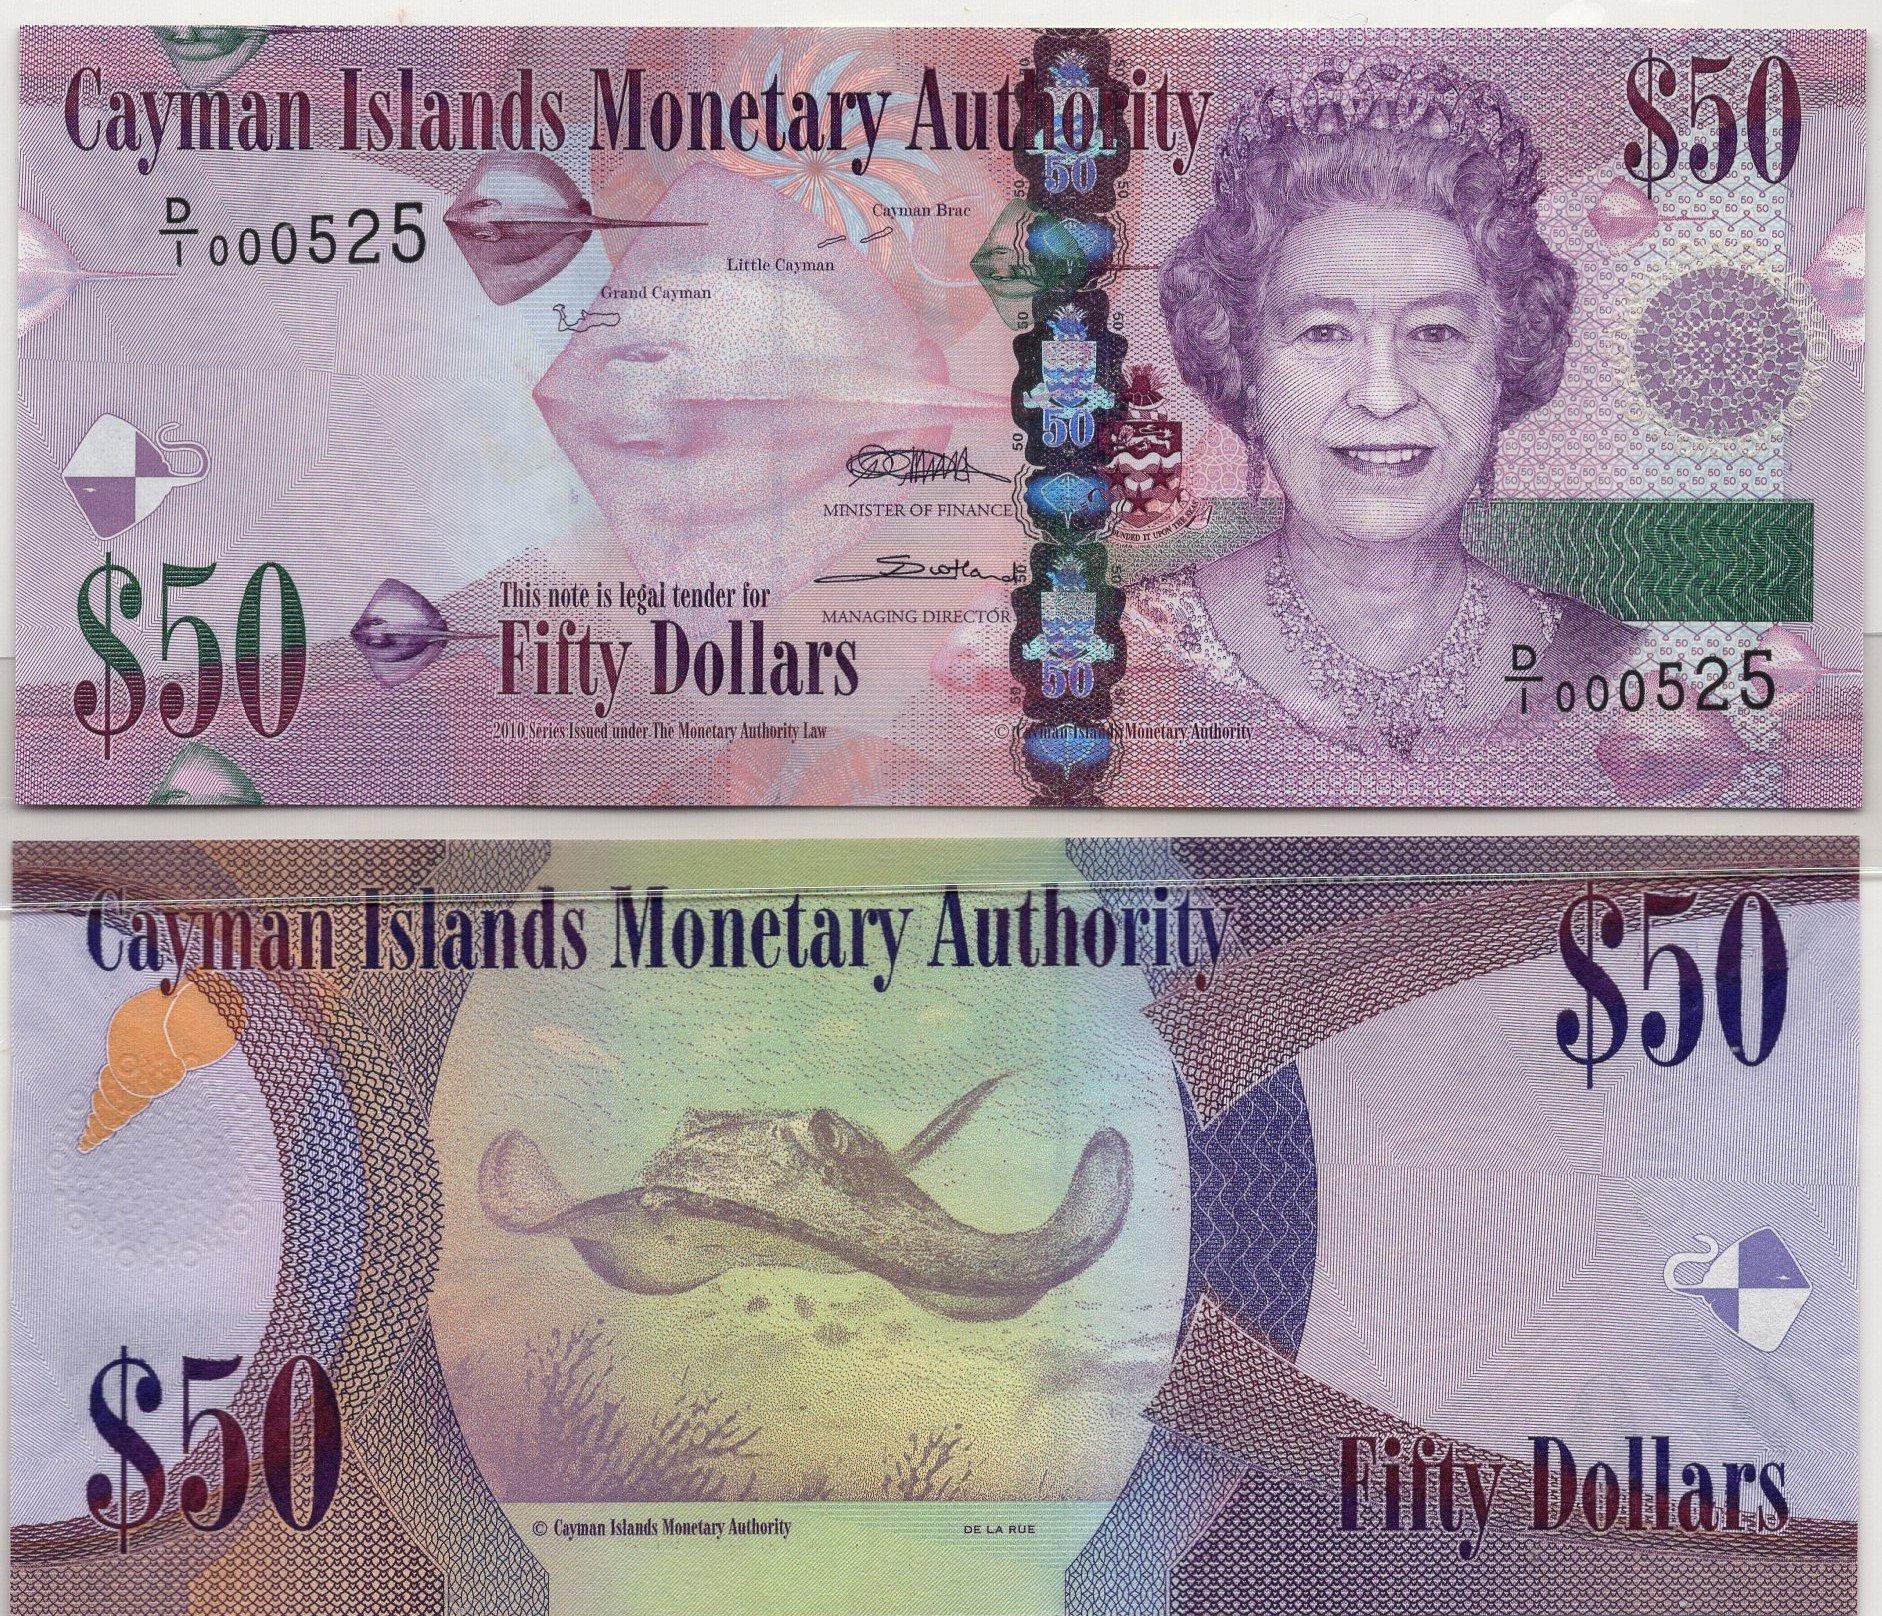 Cayman Islands 10 dollars 2010 for sale